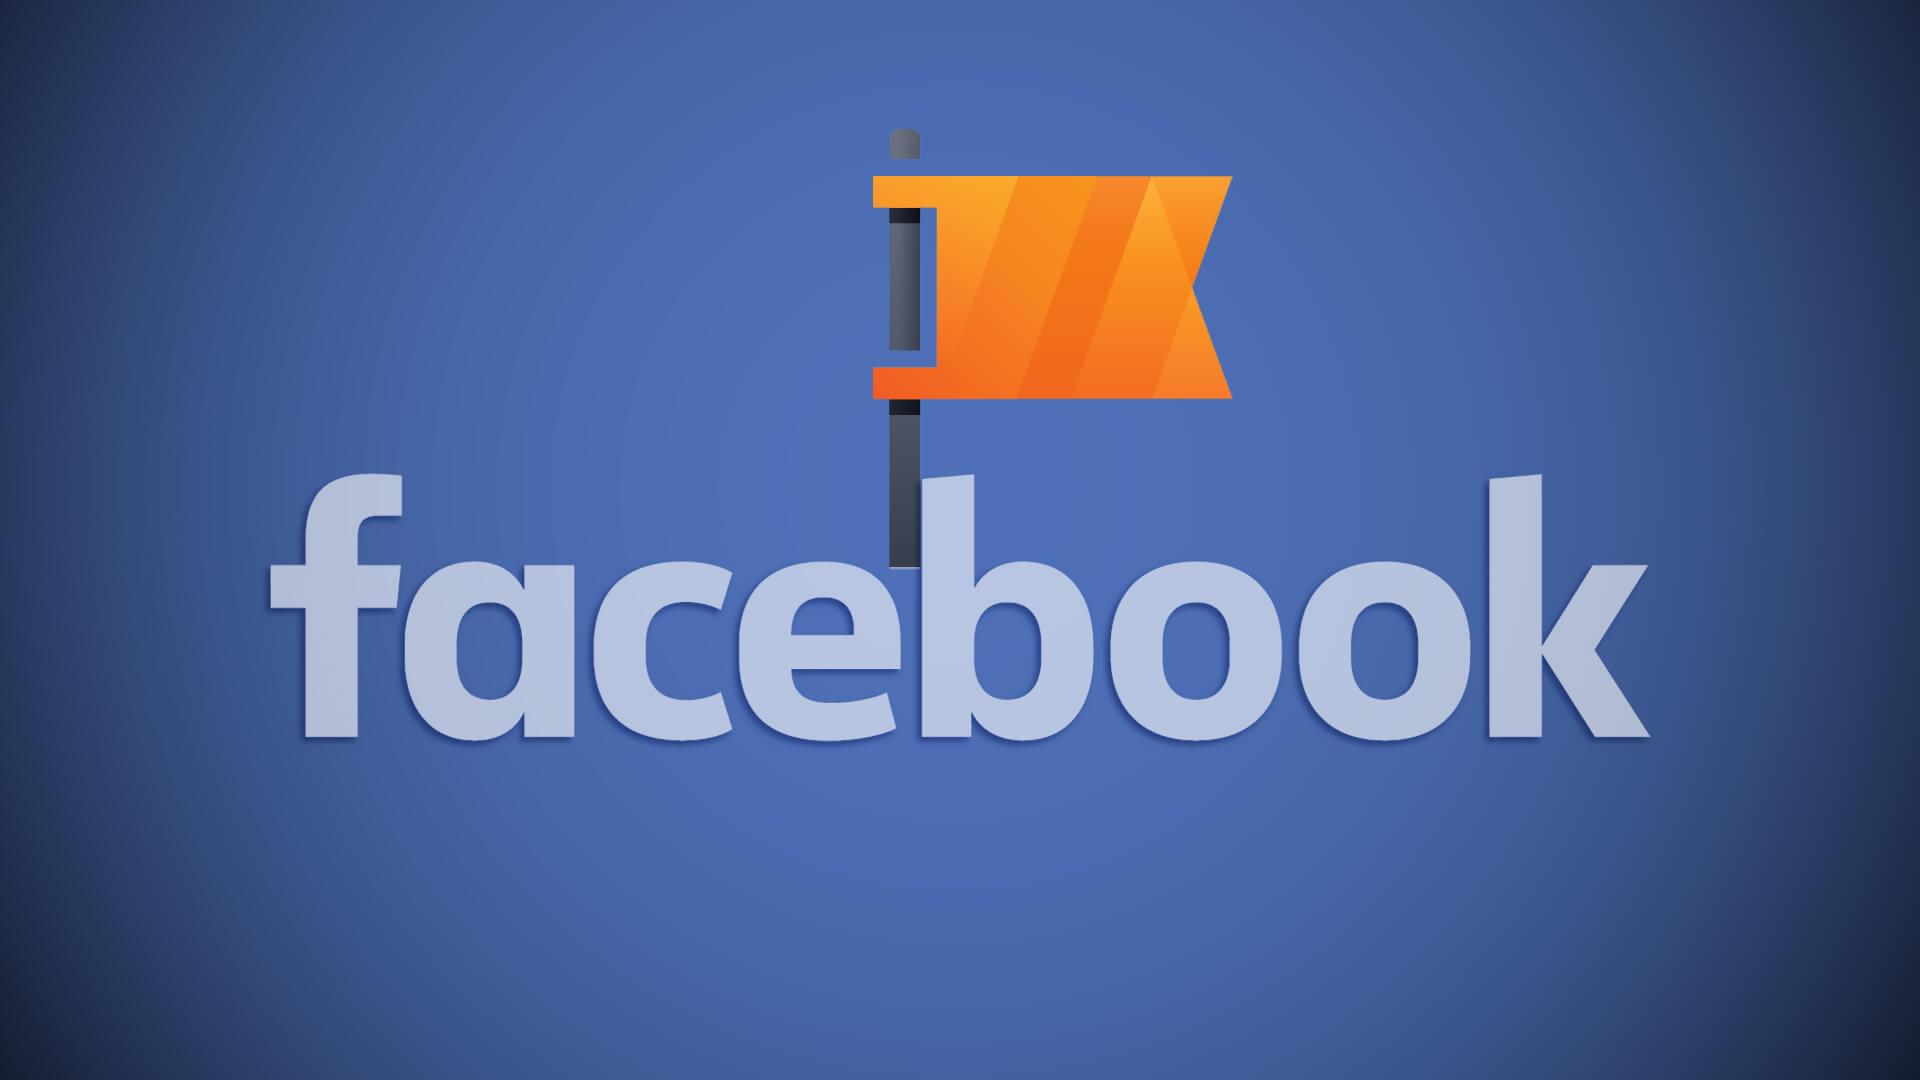 facebook-pages-1920.jpg